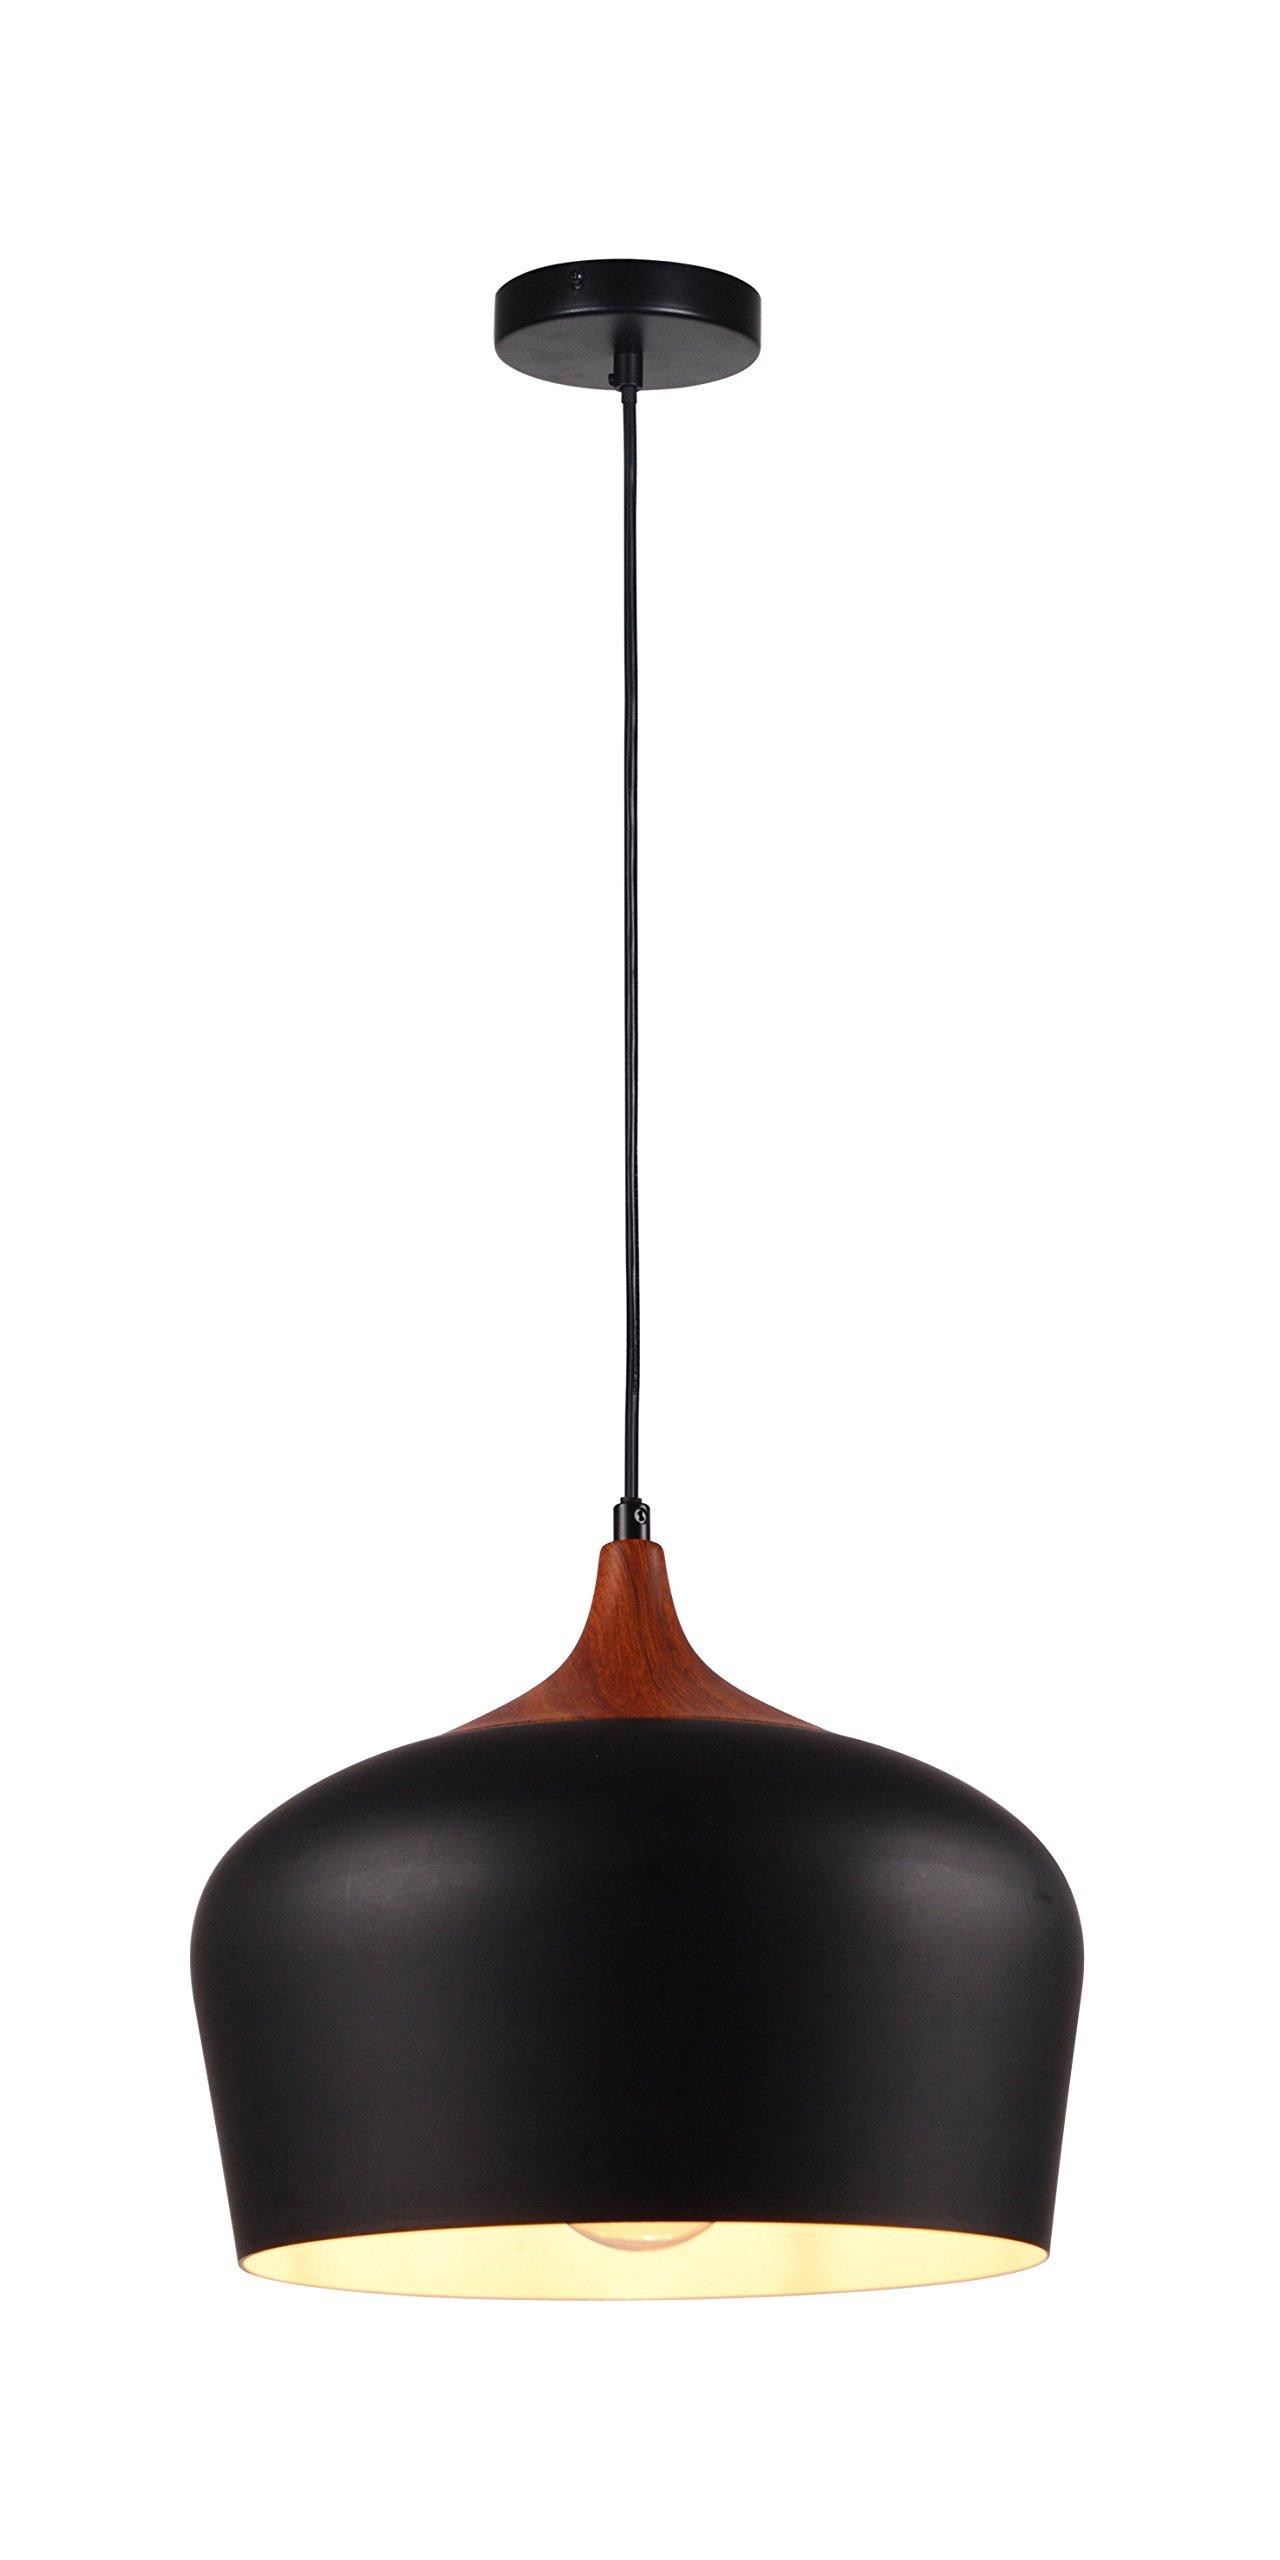 Summitland 12 inch Black Aluminum Pendant Light